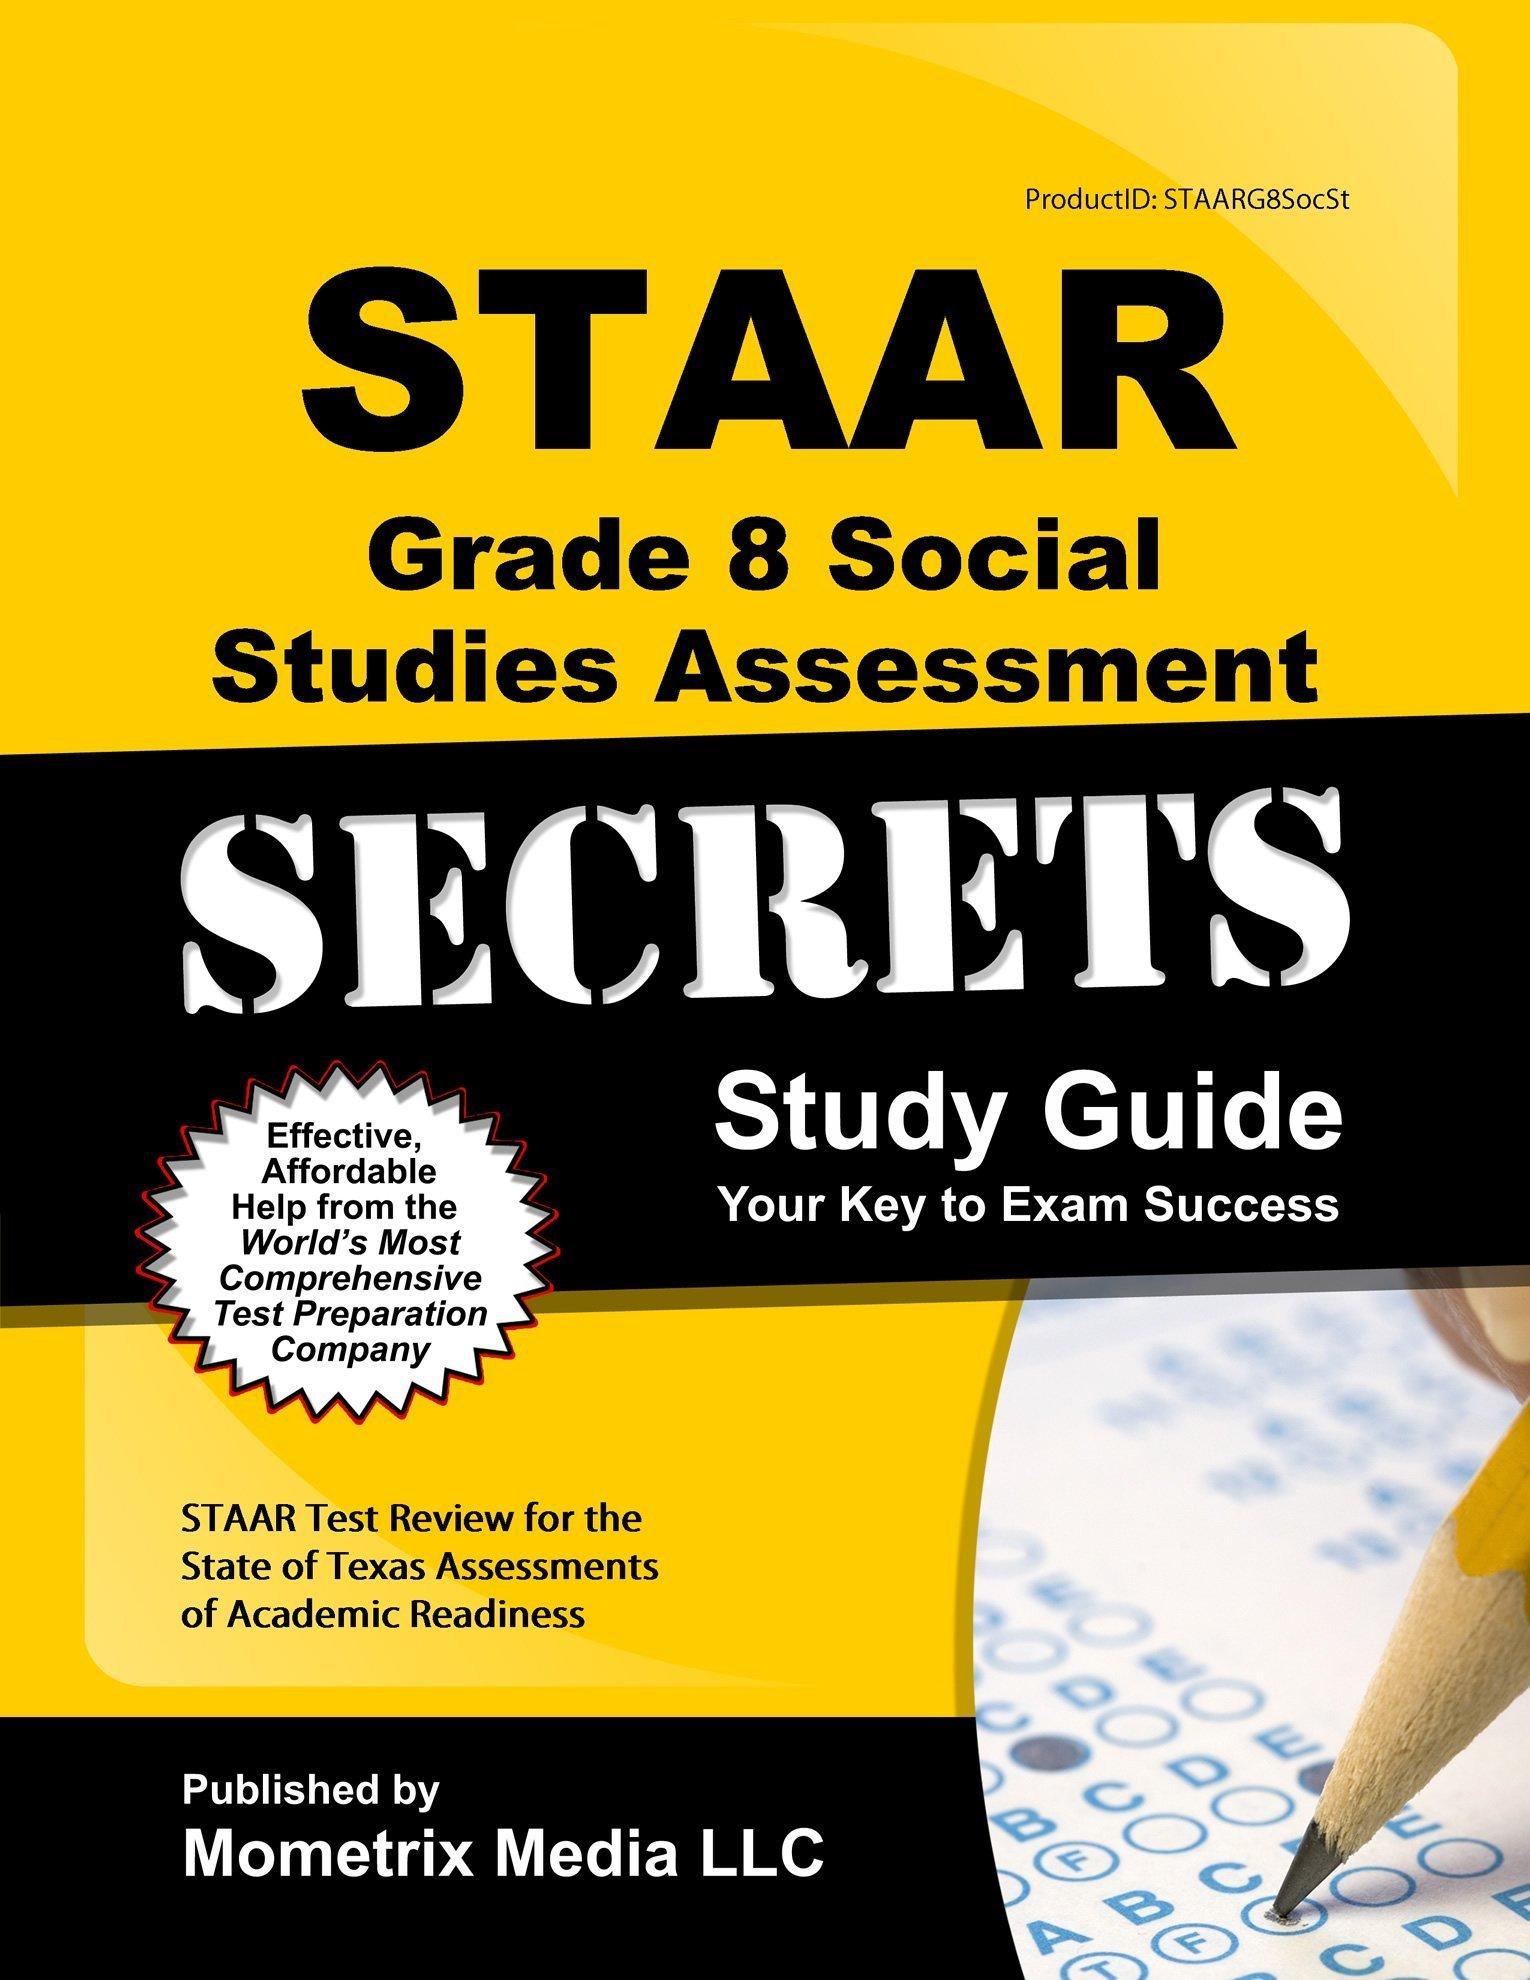 STAAR Grade 8 Social Studies Assessment Secrets Study Guide: STAAR Test  Review for the State of Texas Assessments of Academic Readiness: STAAR Exam  Secrets ...